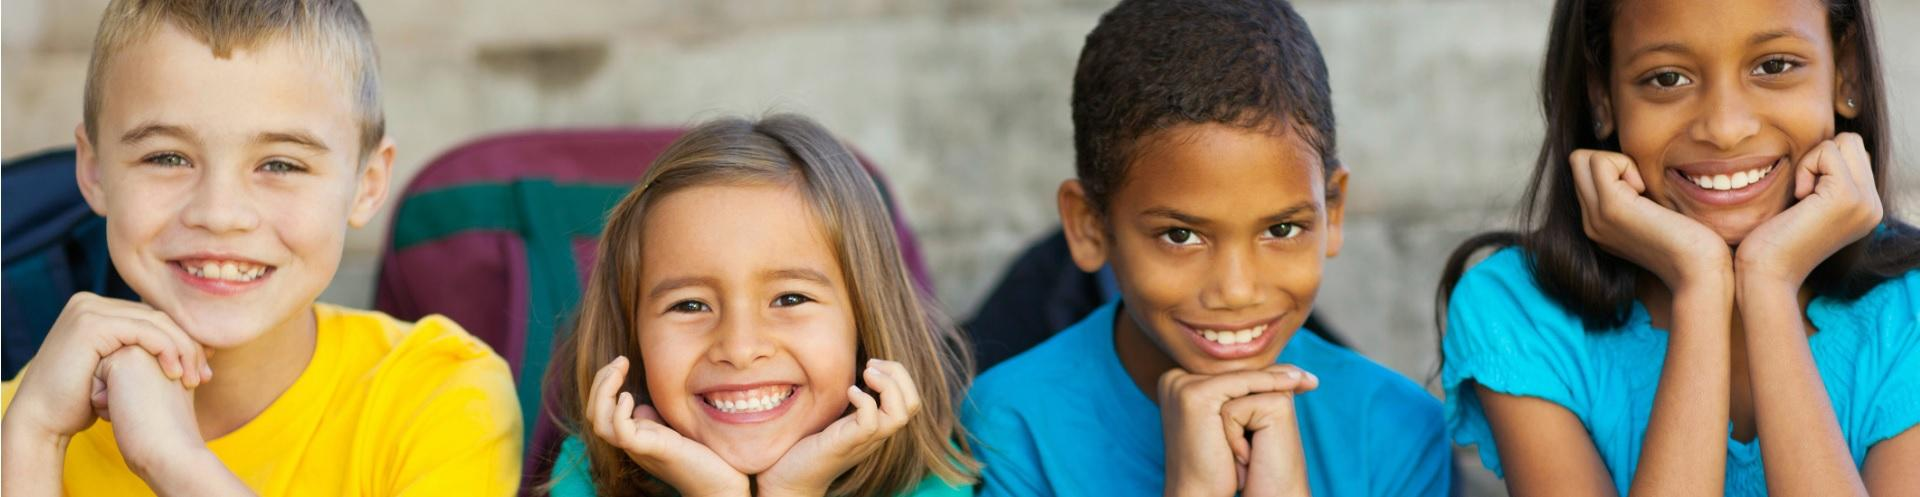 Responding to Child Maltreatment